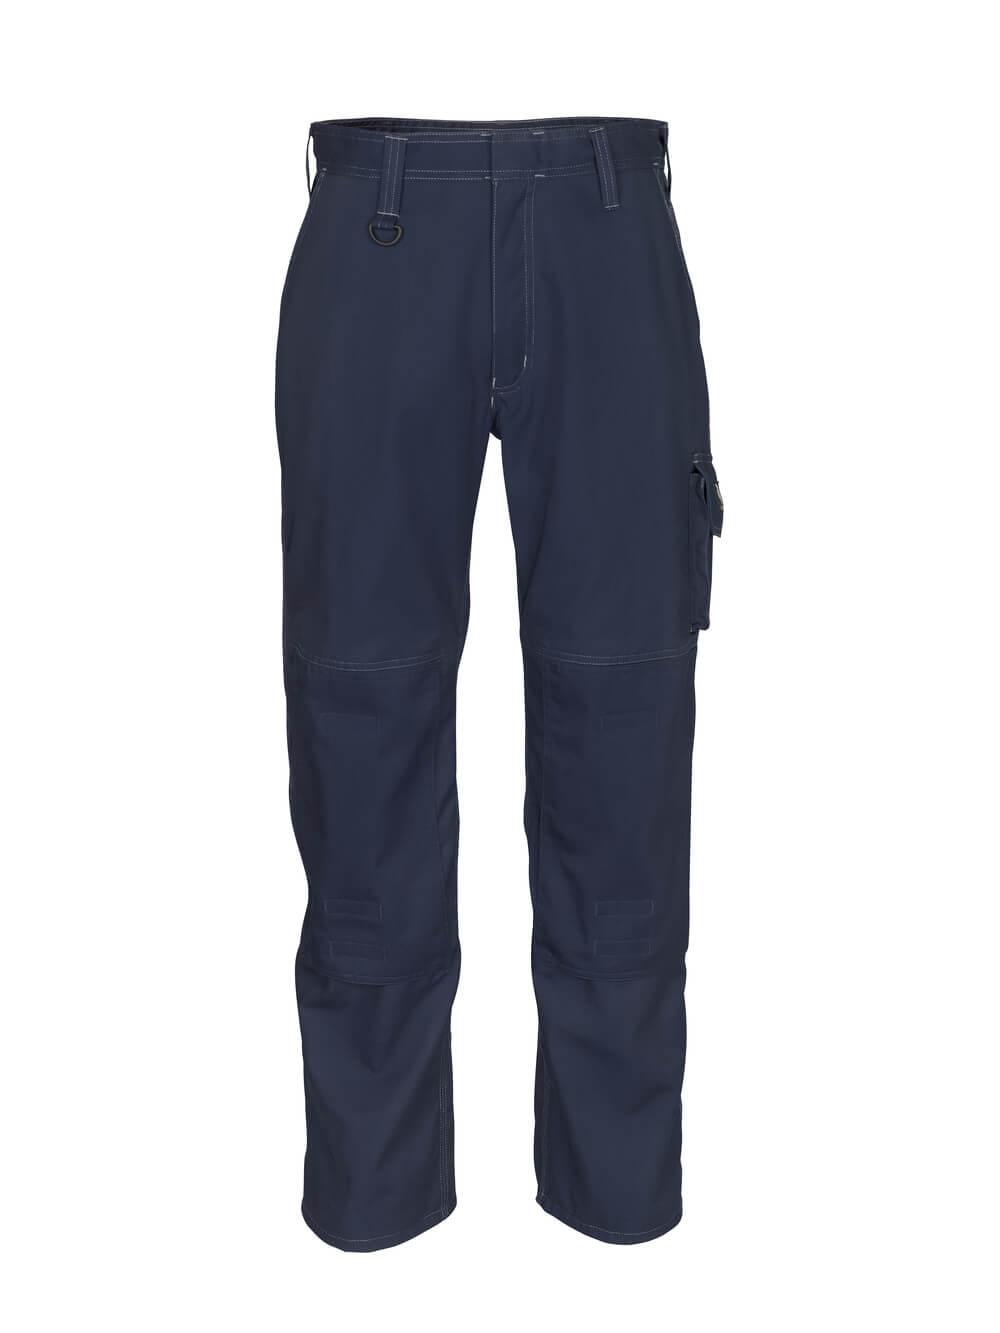 12355-630-010 Pants with kneepad pockets - dark navy